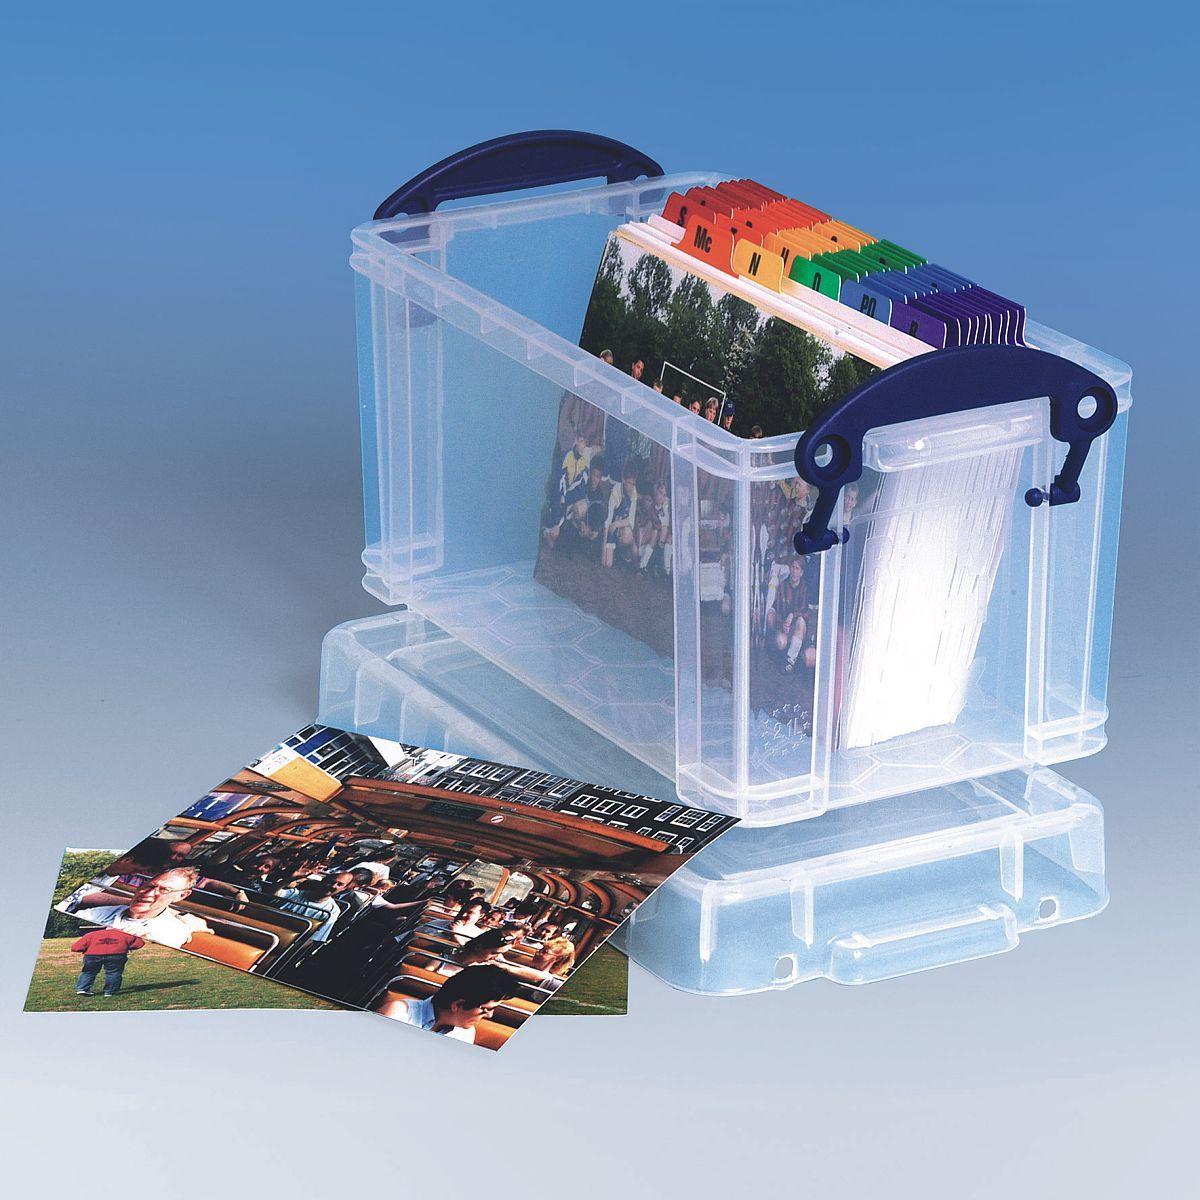 really useful box 2 1 liter box mit deckel online shop clickbox boxen aus kunststoff. Black Bedroom Furniture Sets. Home Design Ideas